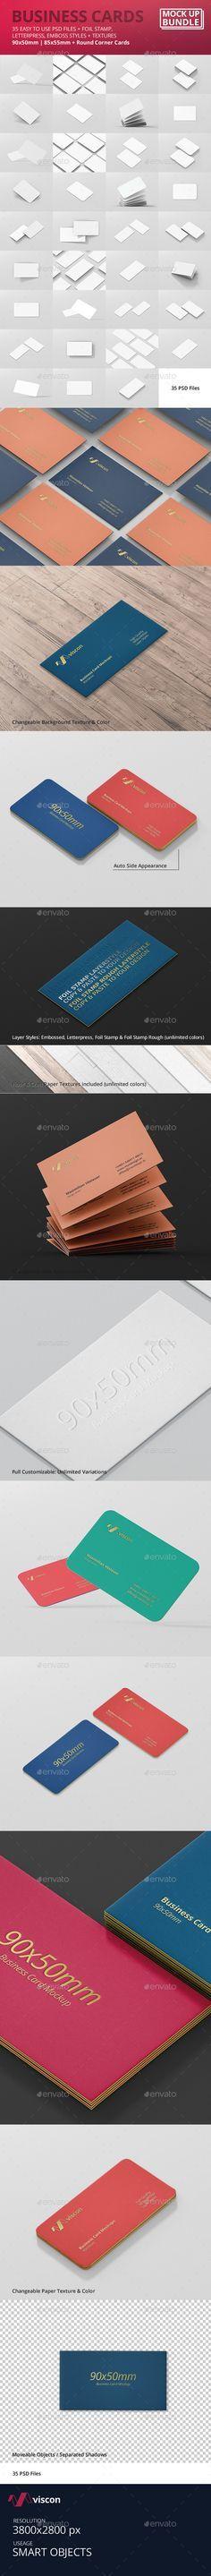 50 best package design mock up graphics images on pinterest business card mock up bundle reheart Image collections